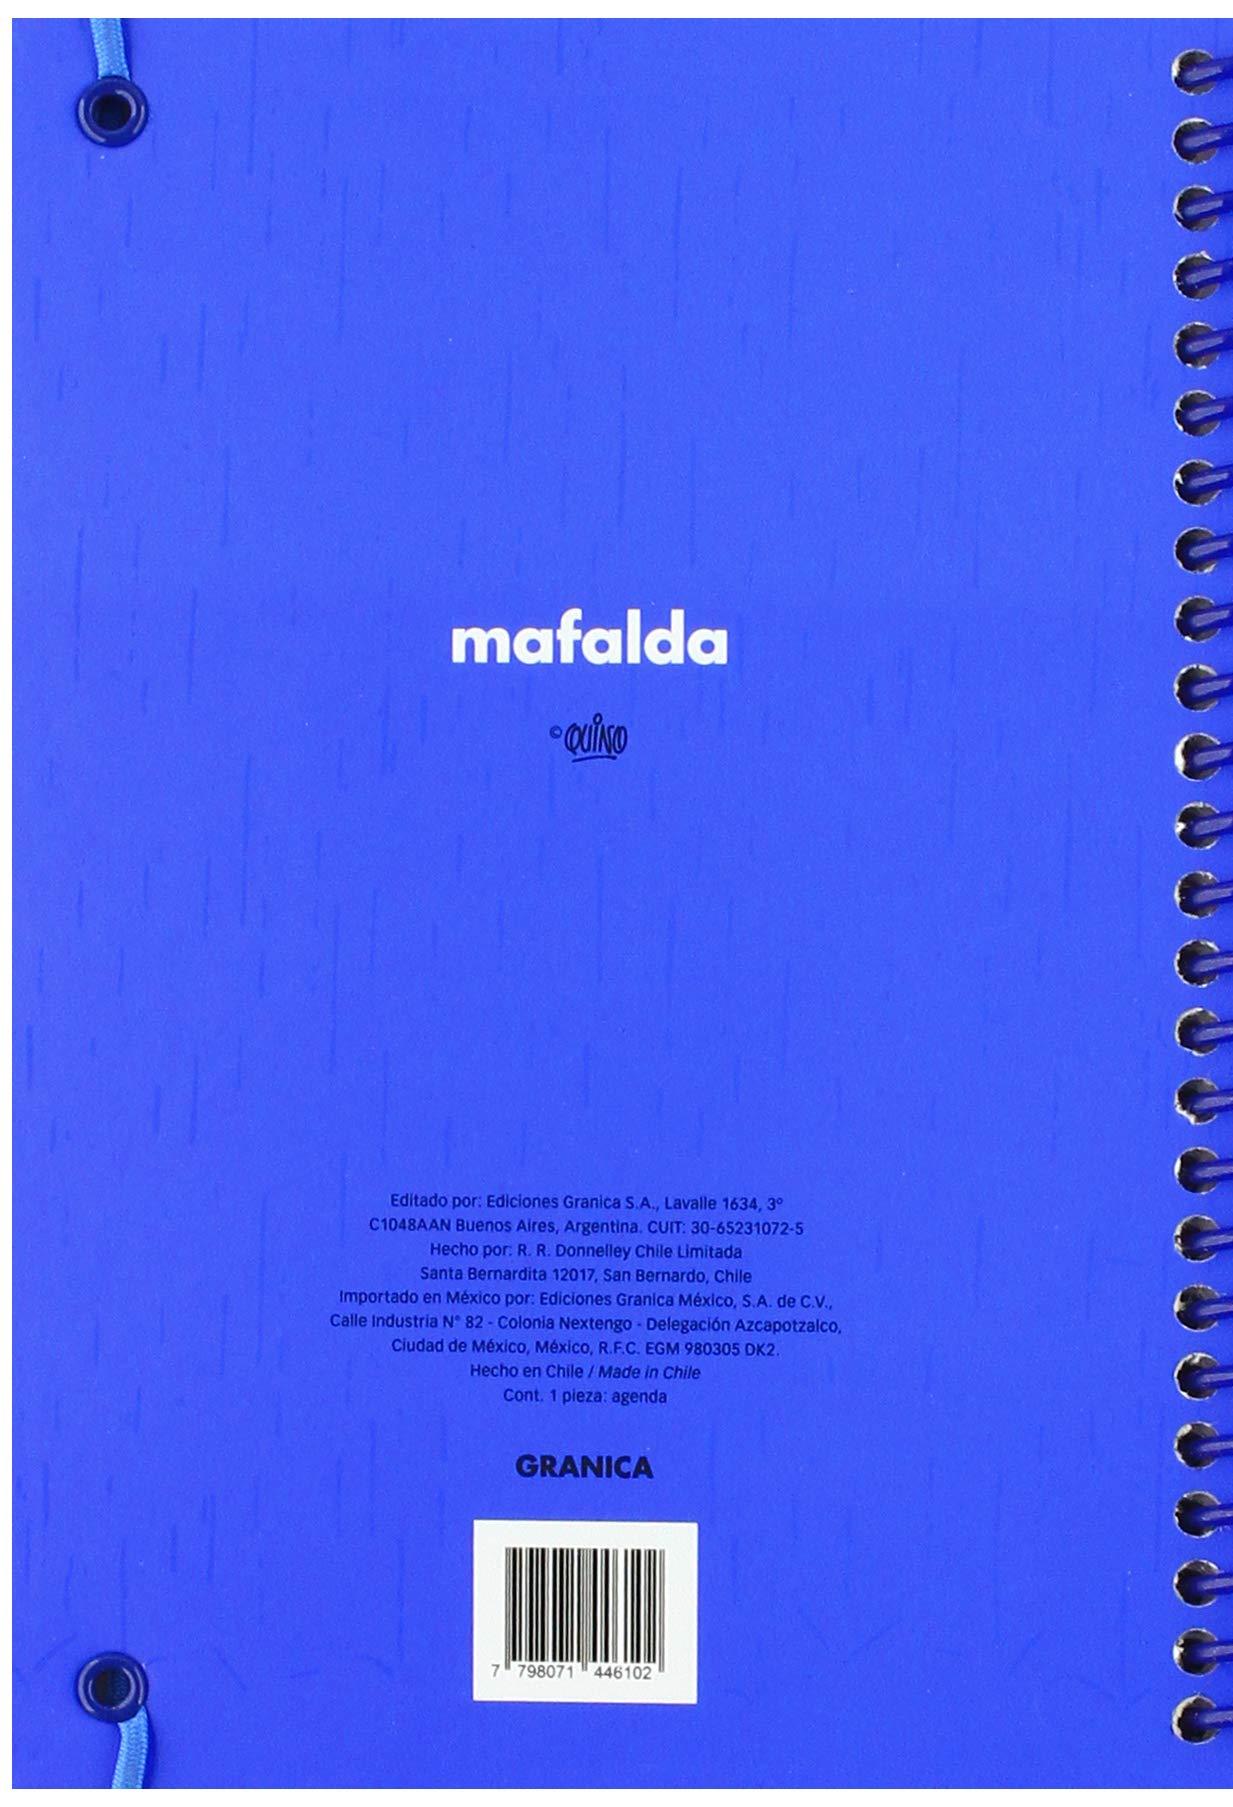 Granica GB00096 - Mafalda 2019 anillada: Amazon.es: Libros